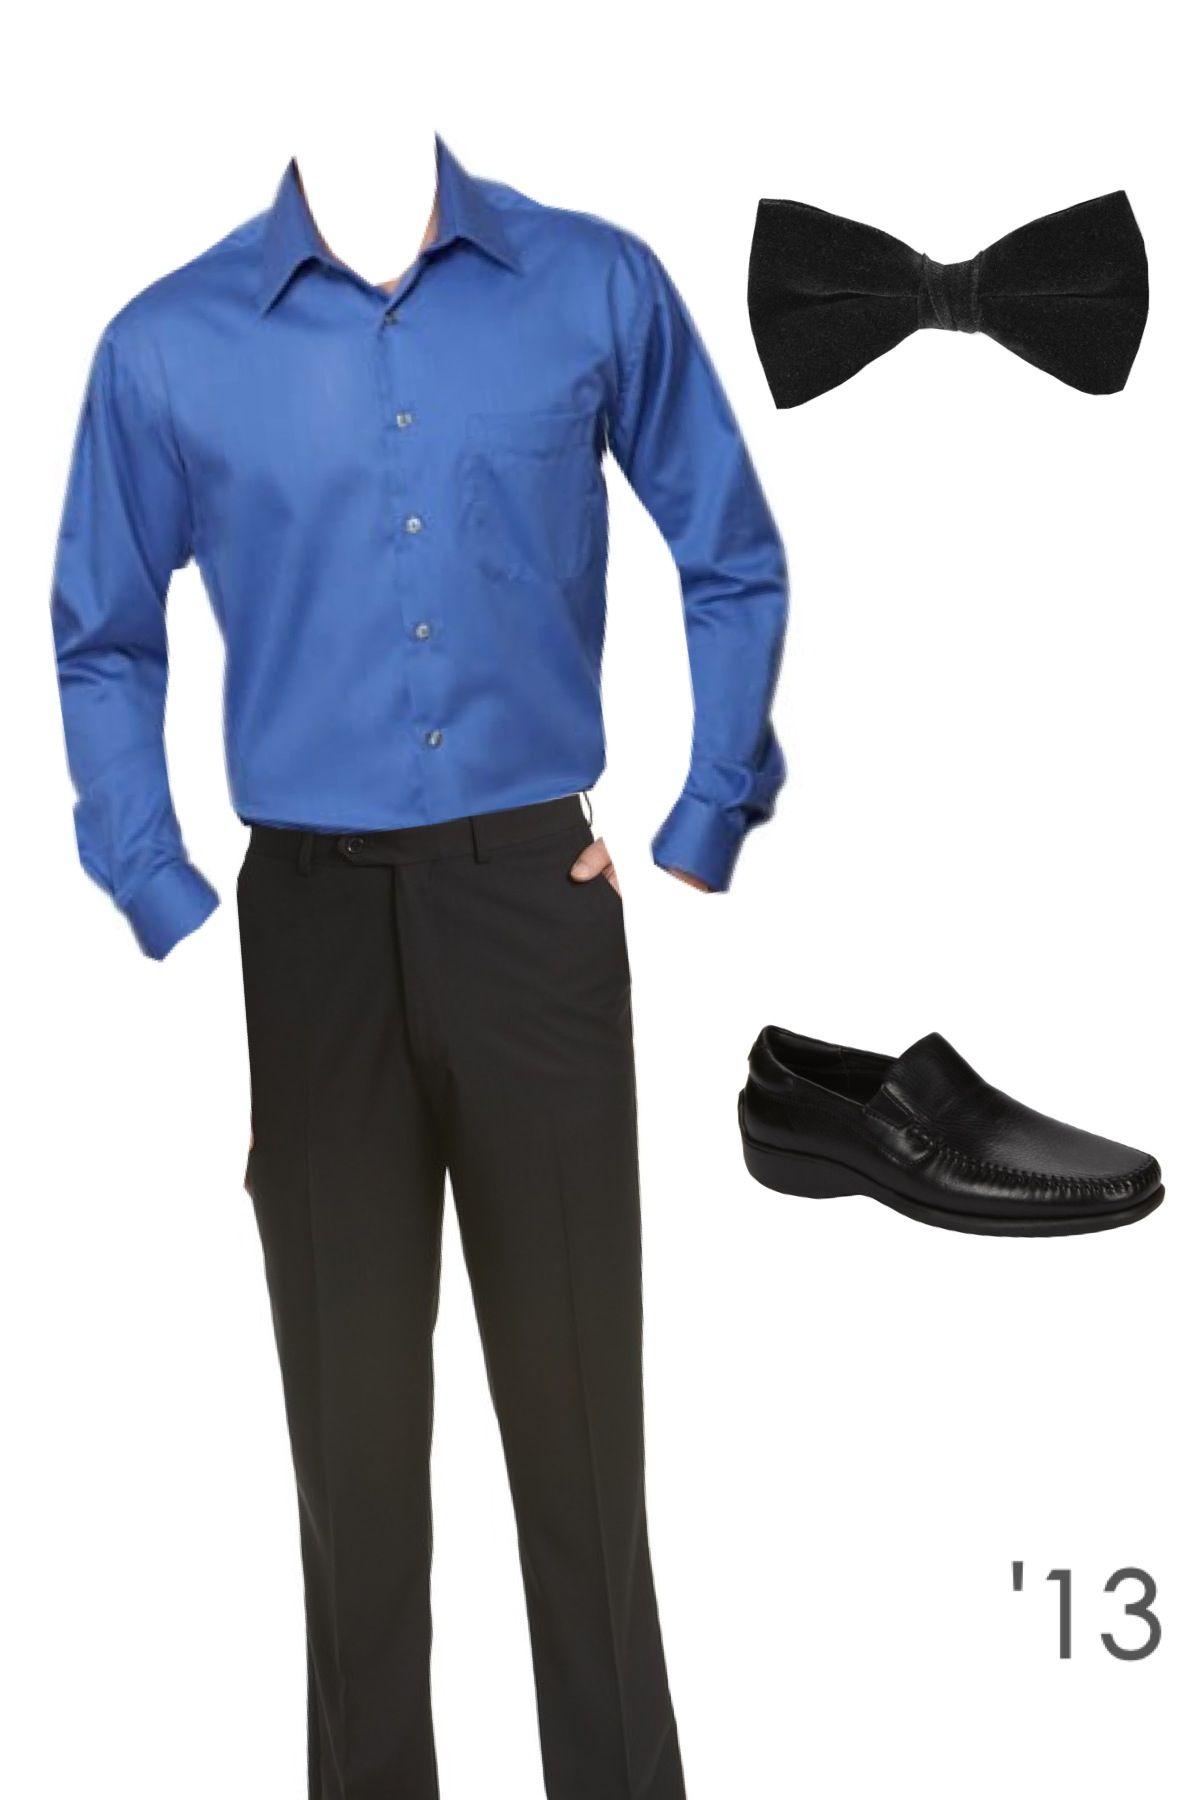 Men S Formal Black Dress Pants Shoes Bow Tie And Blue Collared Dress Shirt Dapper Neat Fancy Black Dress Pants Men Blue Shirt Dress Black Dress Formal [ 1800 x 1200 Pixel ]